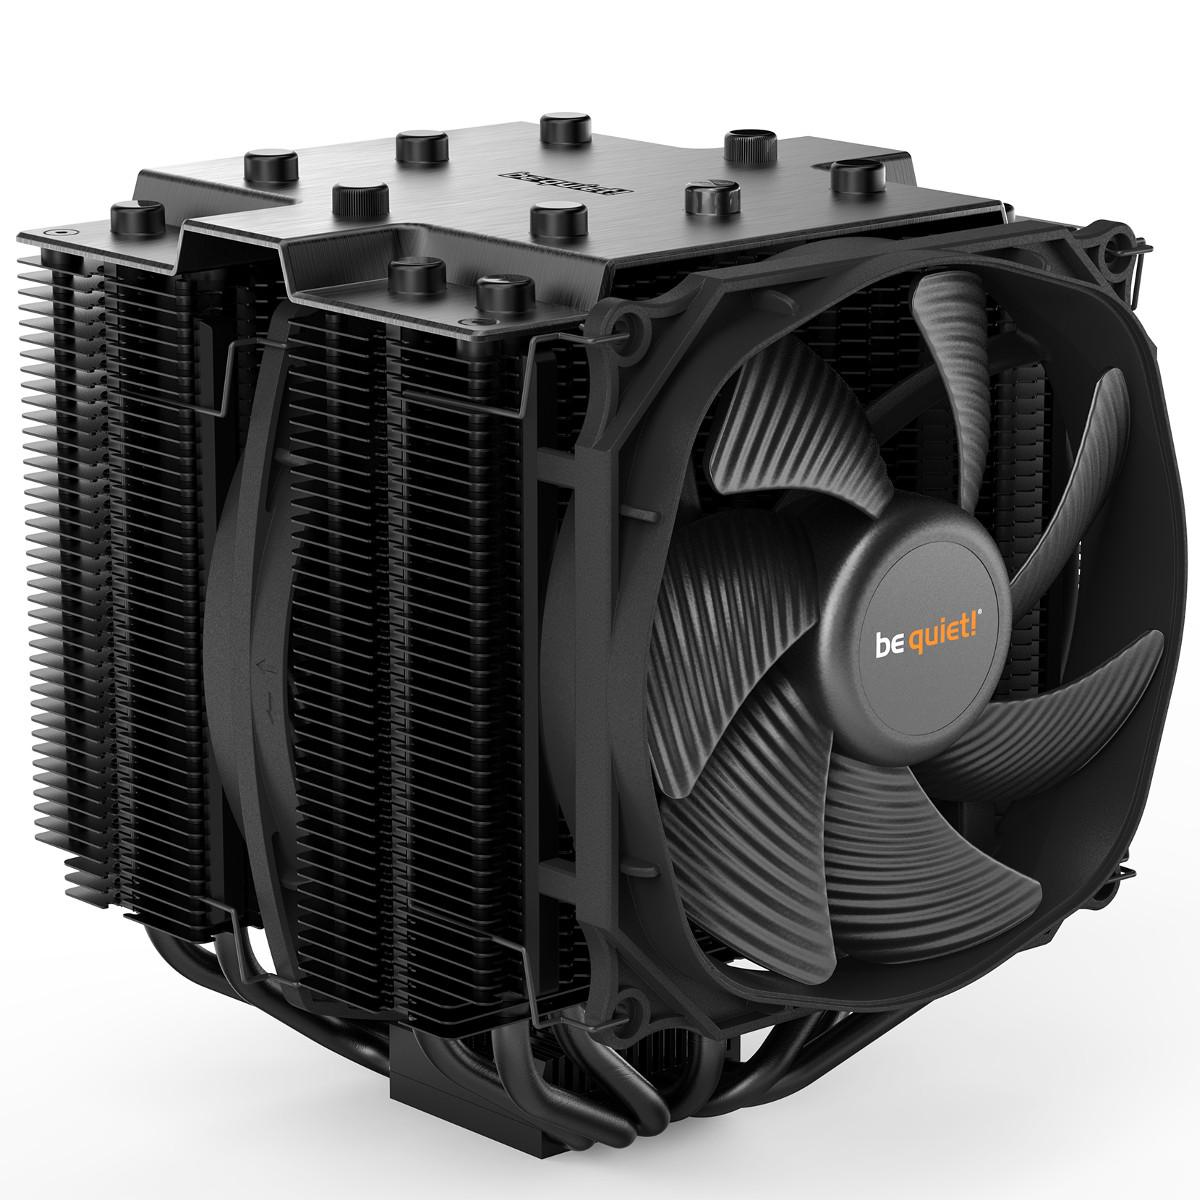 be quiet! Dark Rock Pro 4 50.5 CFM CPU Cooler